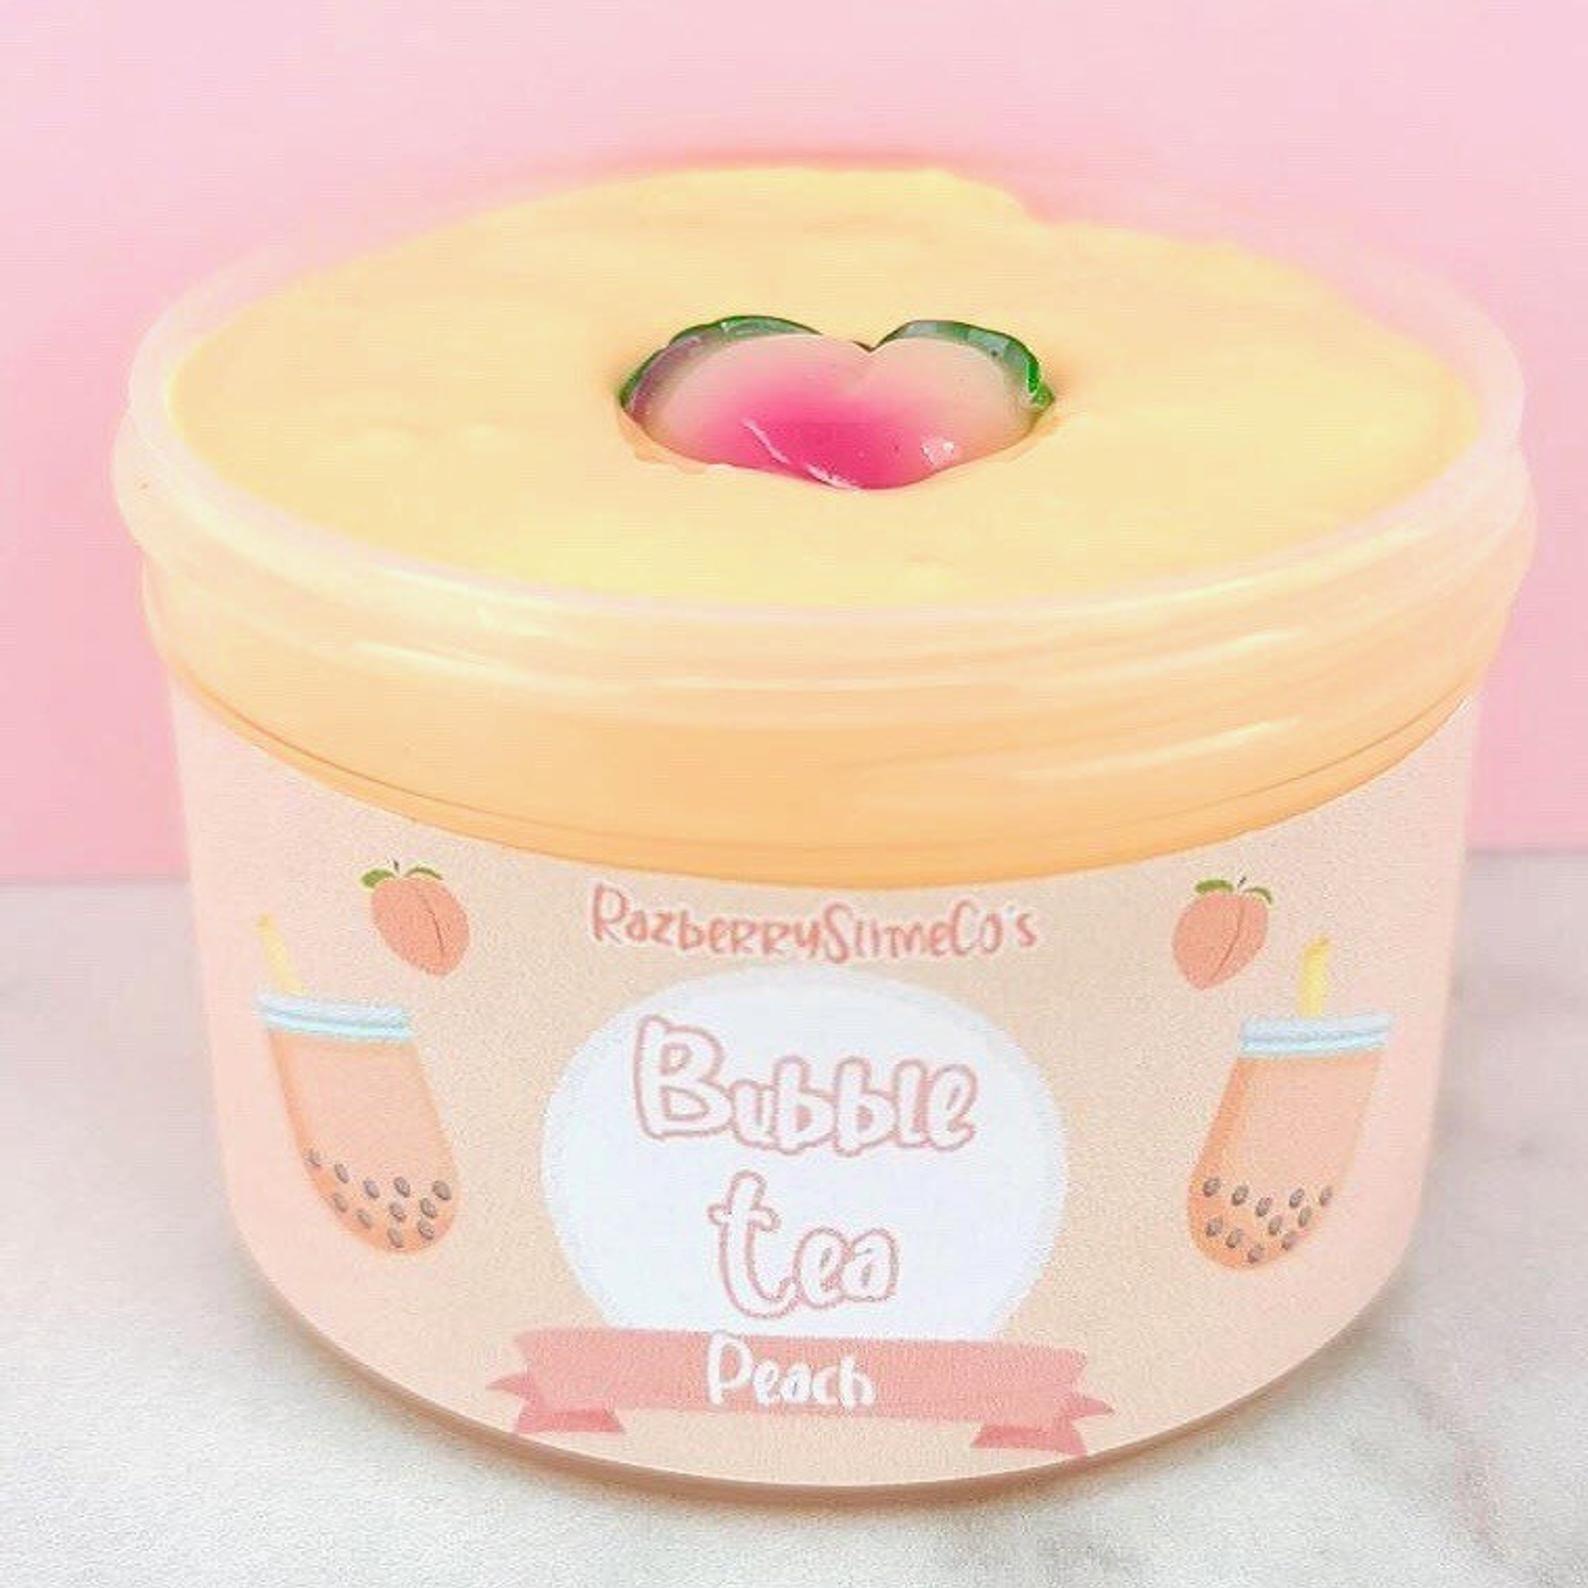 A peach colored jar of bubble tea slime with a peach charm on top